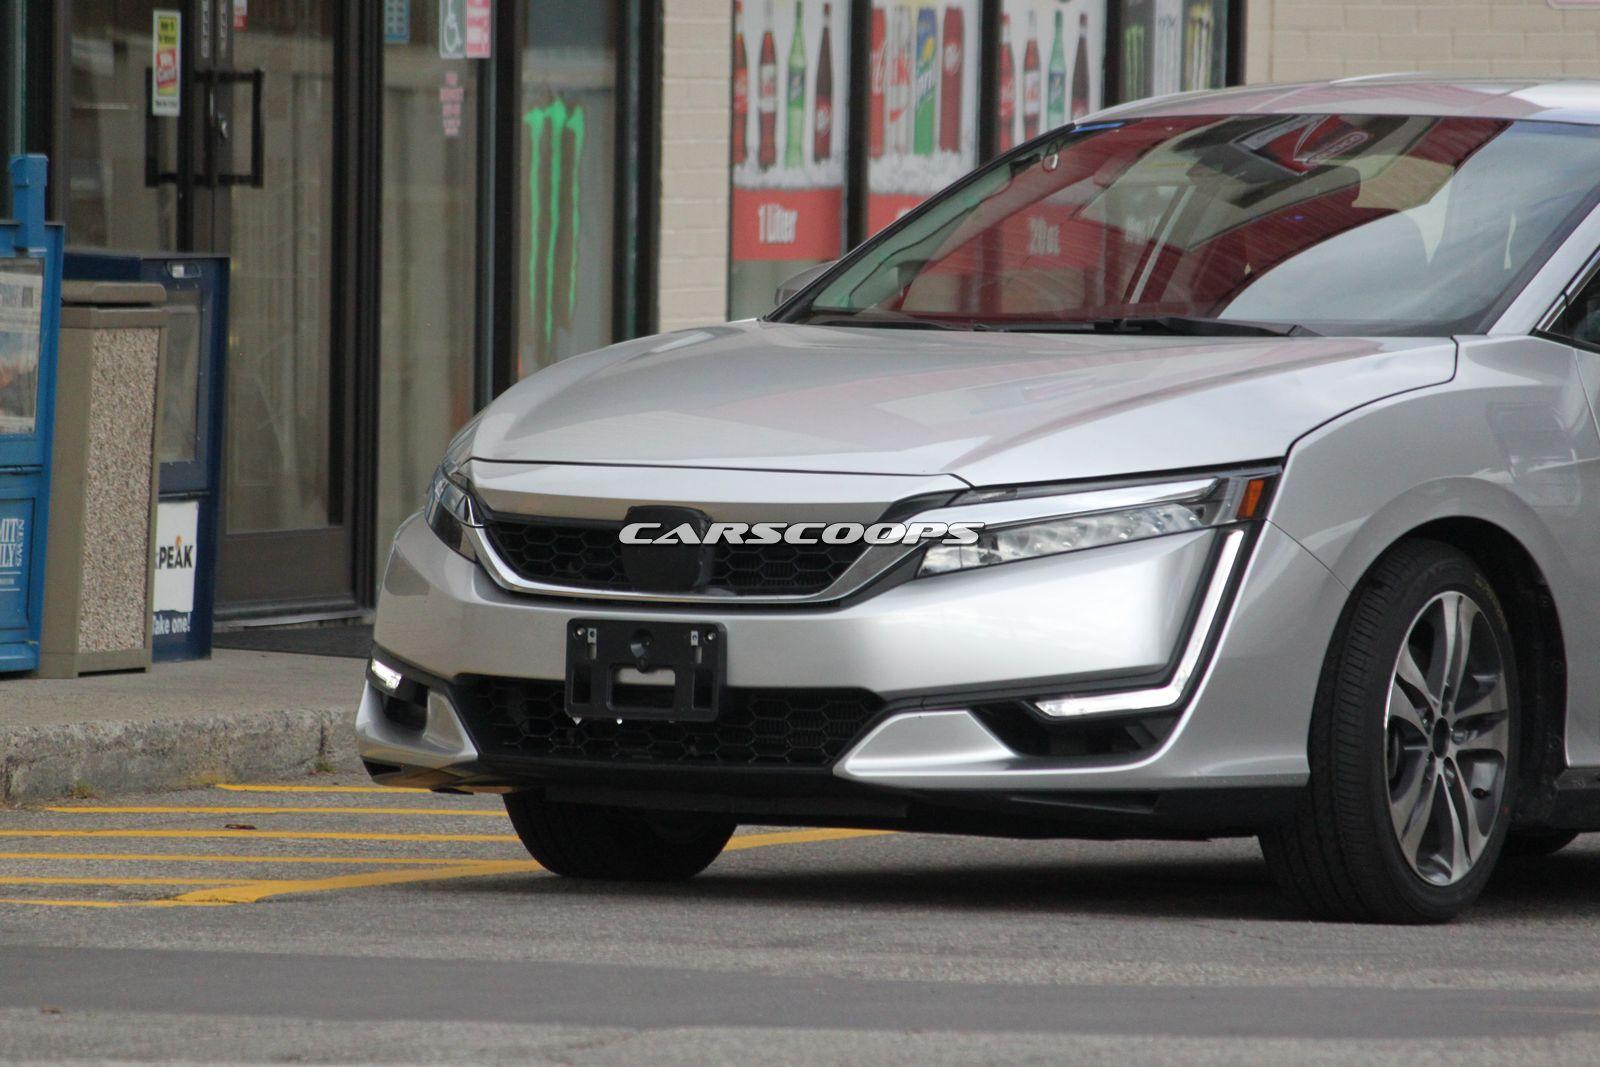 U Poged likewise  in addition Honda Bclarity B likewise Inside Veneno X also Illustrious Std. on 4 million cars recalled